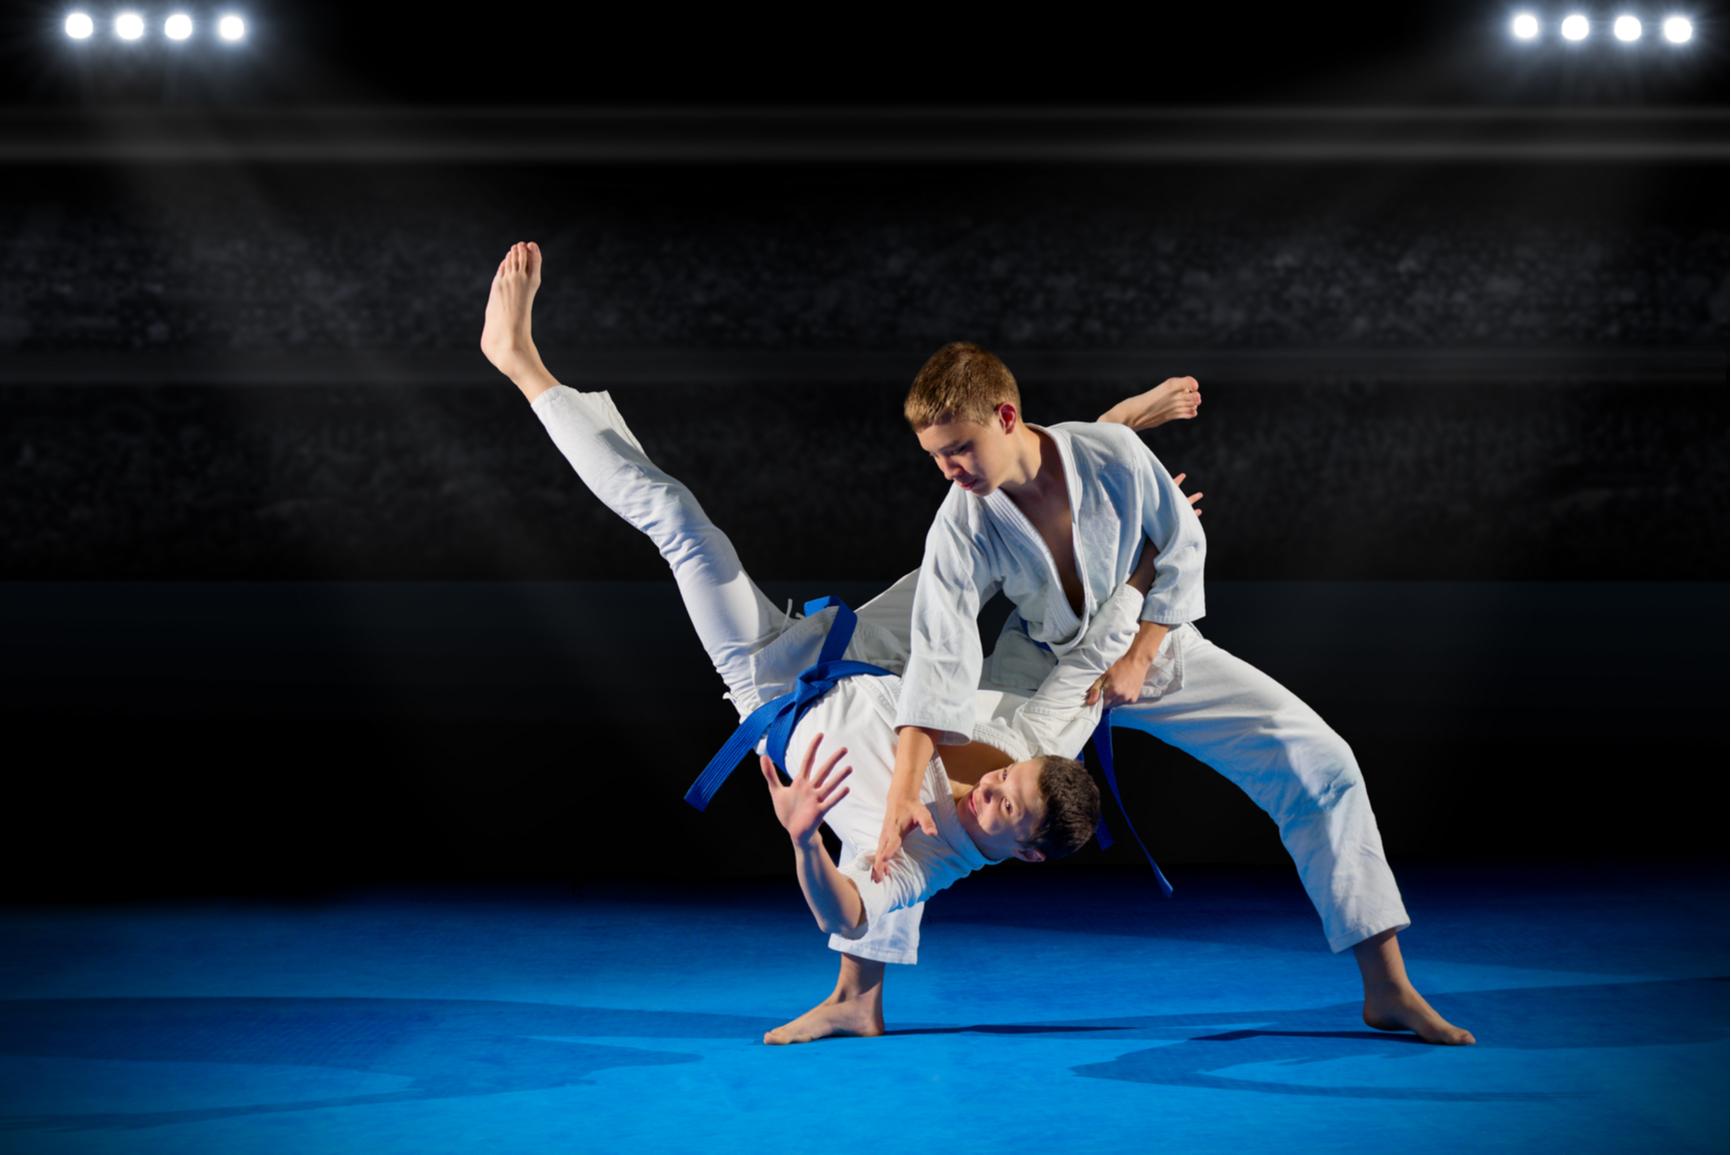 judo classes near me - judo lessons